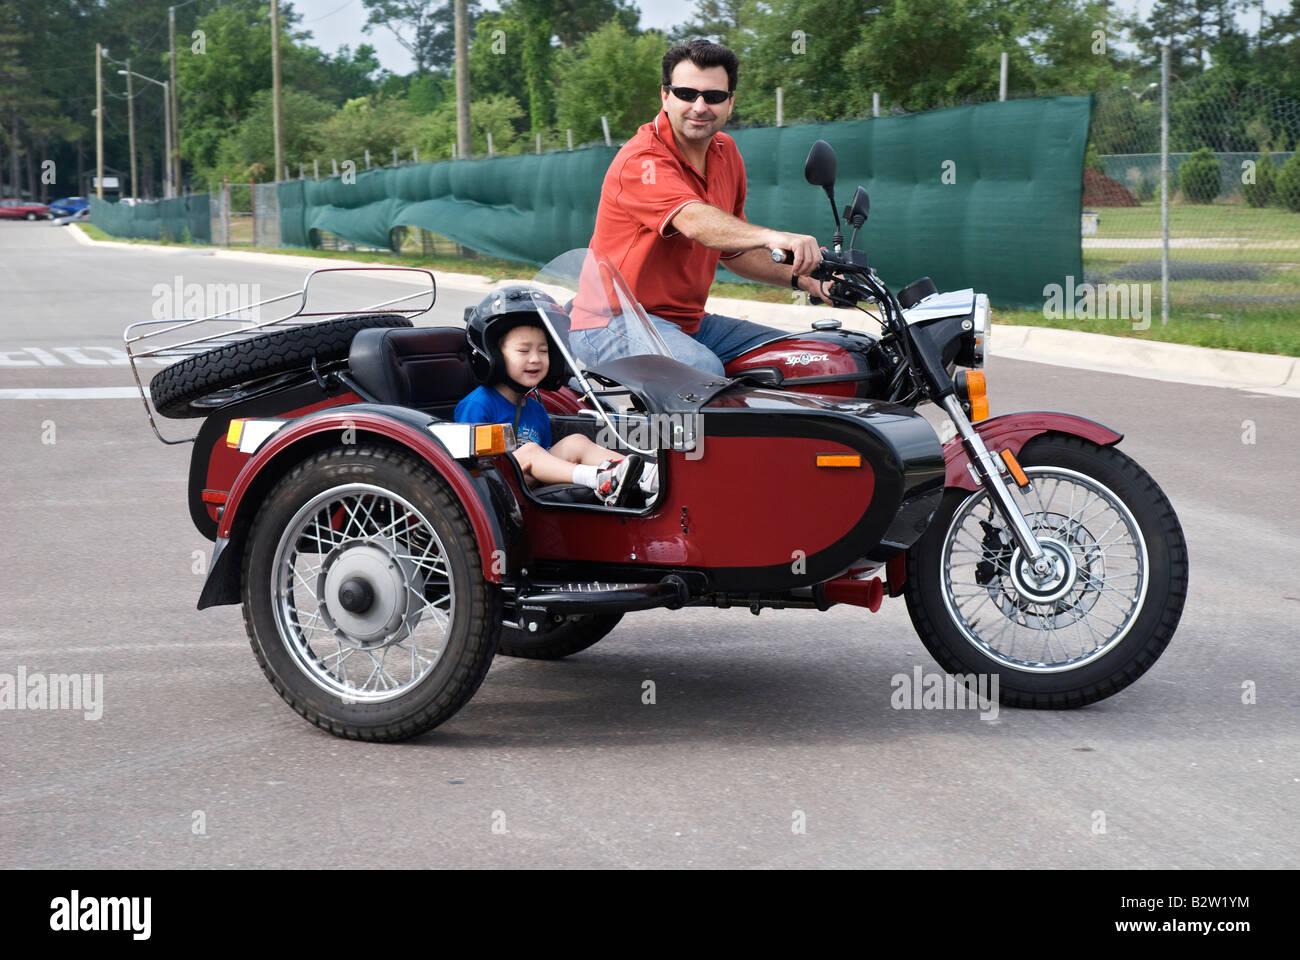 Motorcycle Sidecar Penger Stock Photos